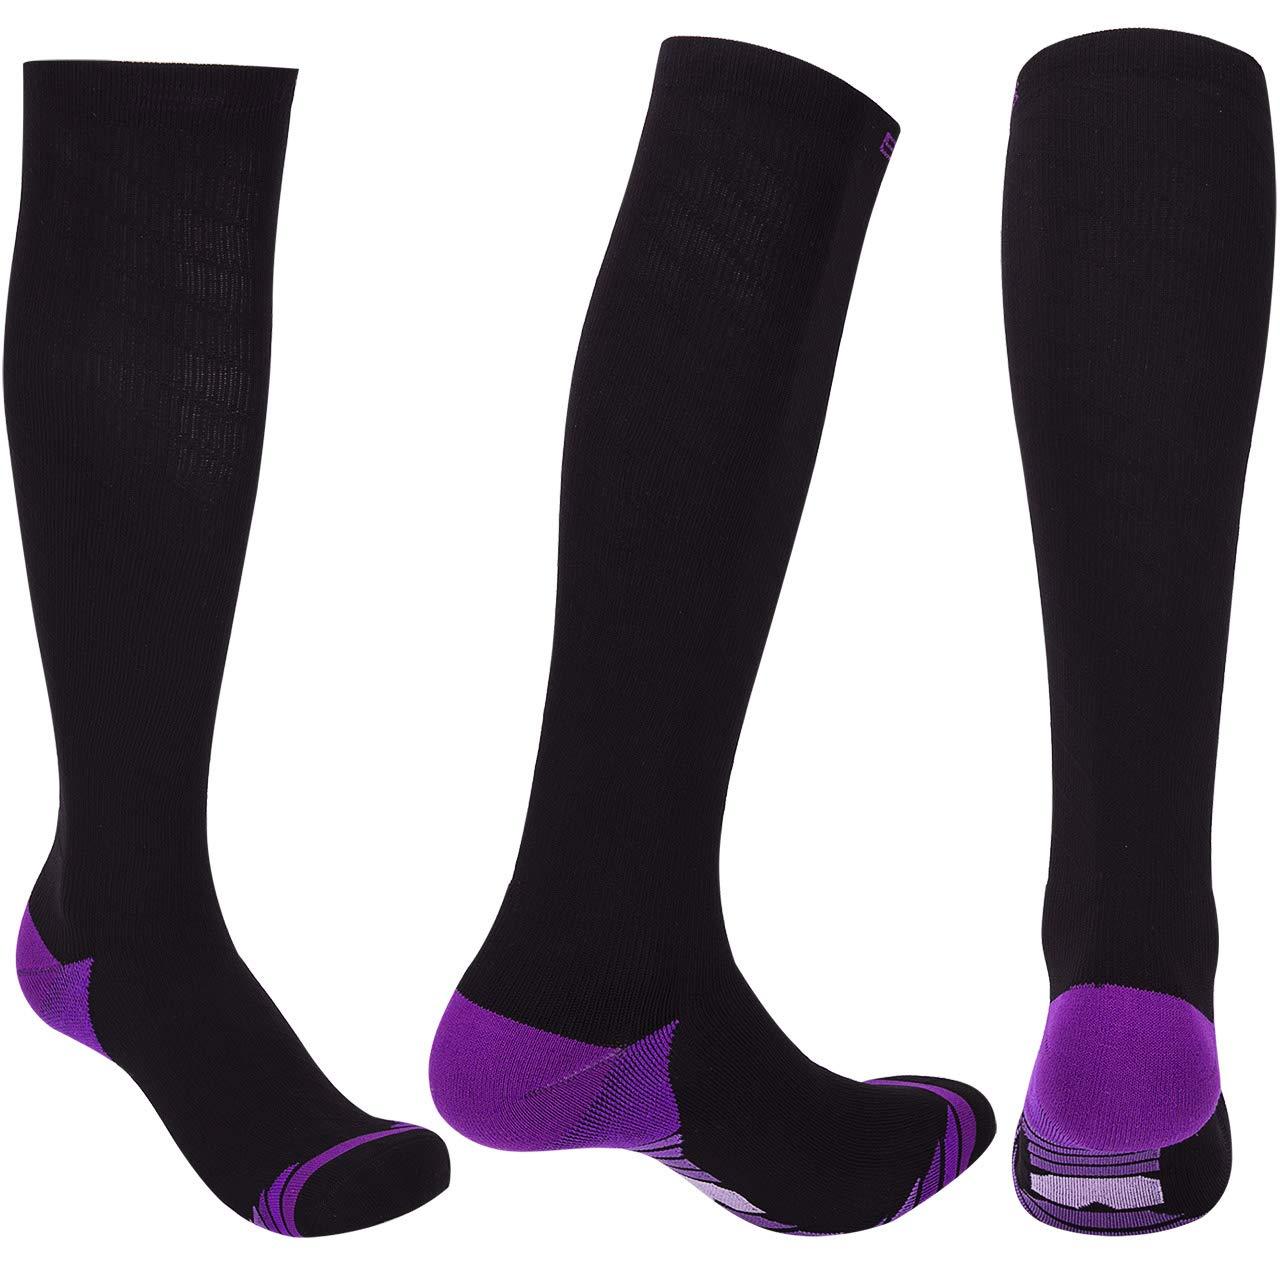 a98226201 Graduated Compression Socks for Men Women (20-30 mmHg) Best Athletic Fit  for Nurses